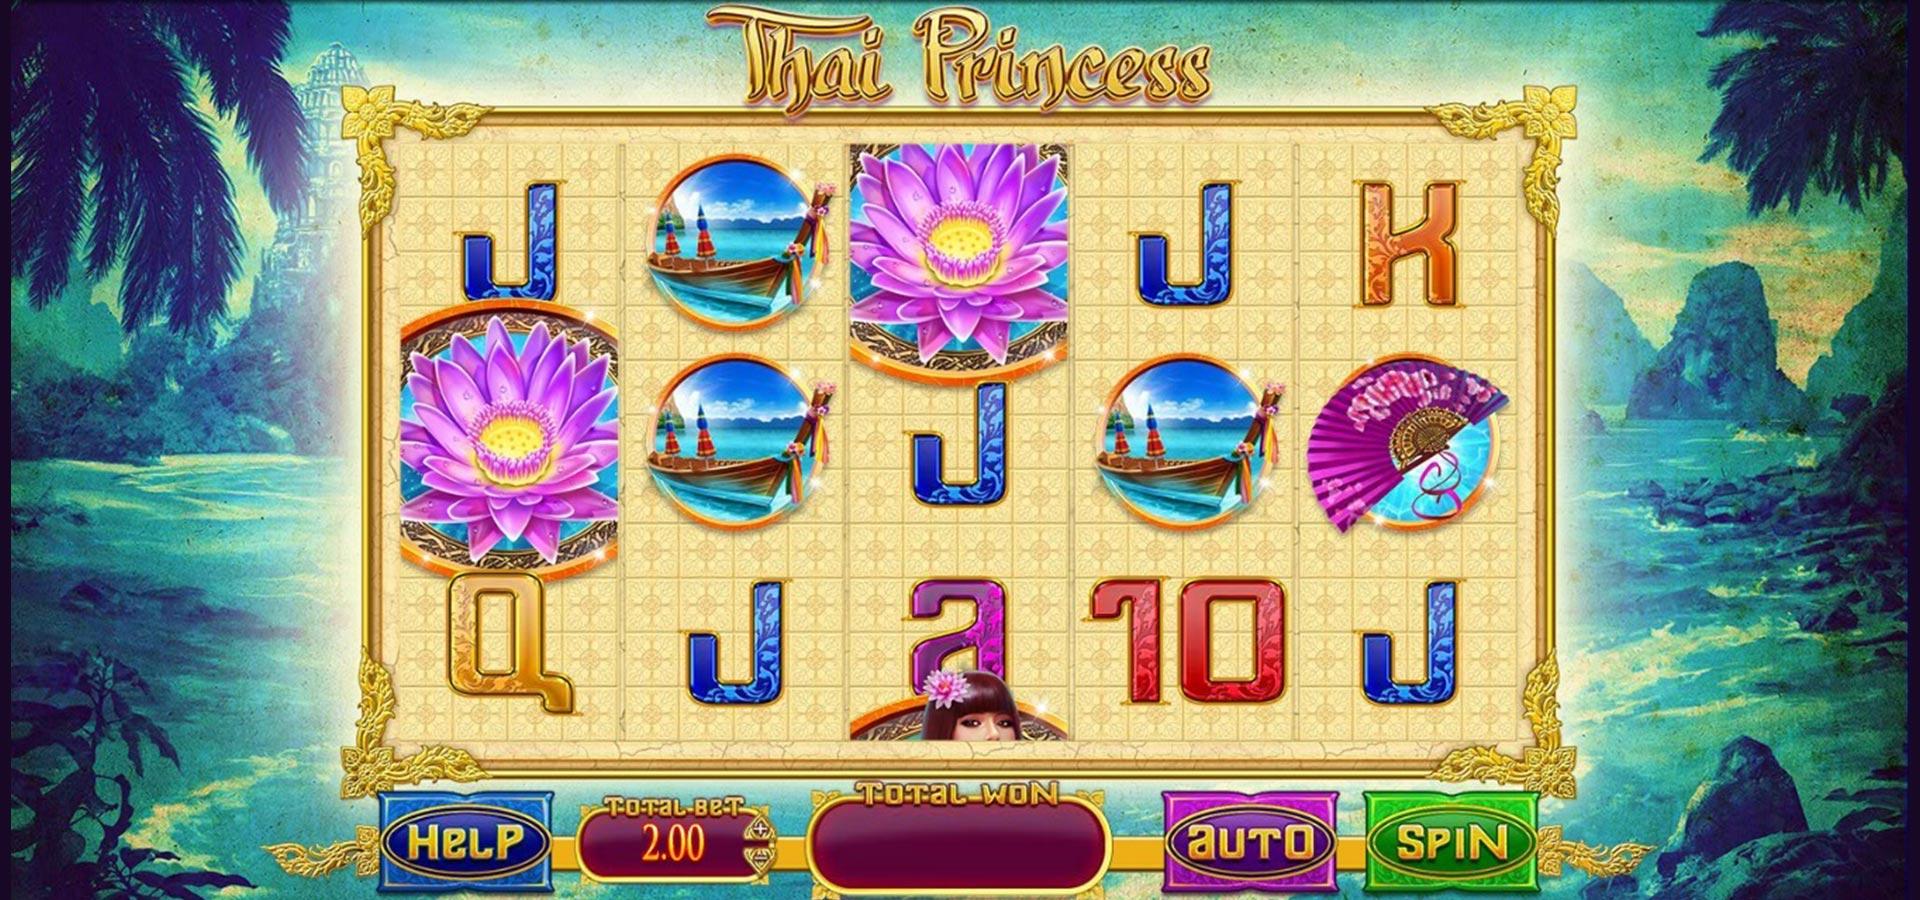 play thai princess slots